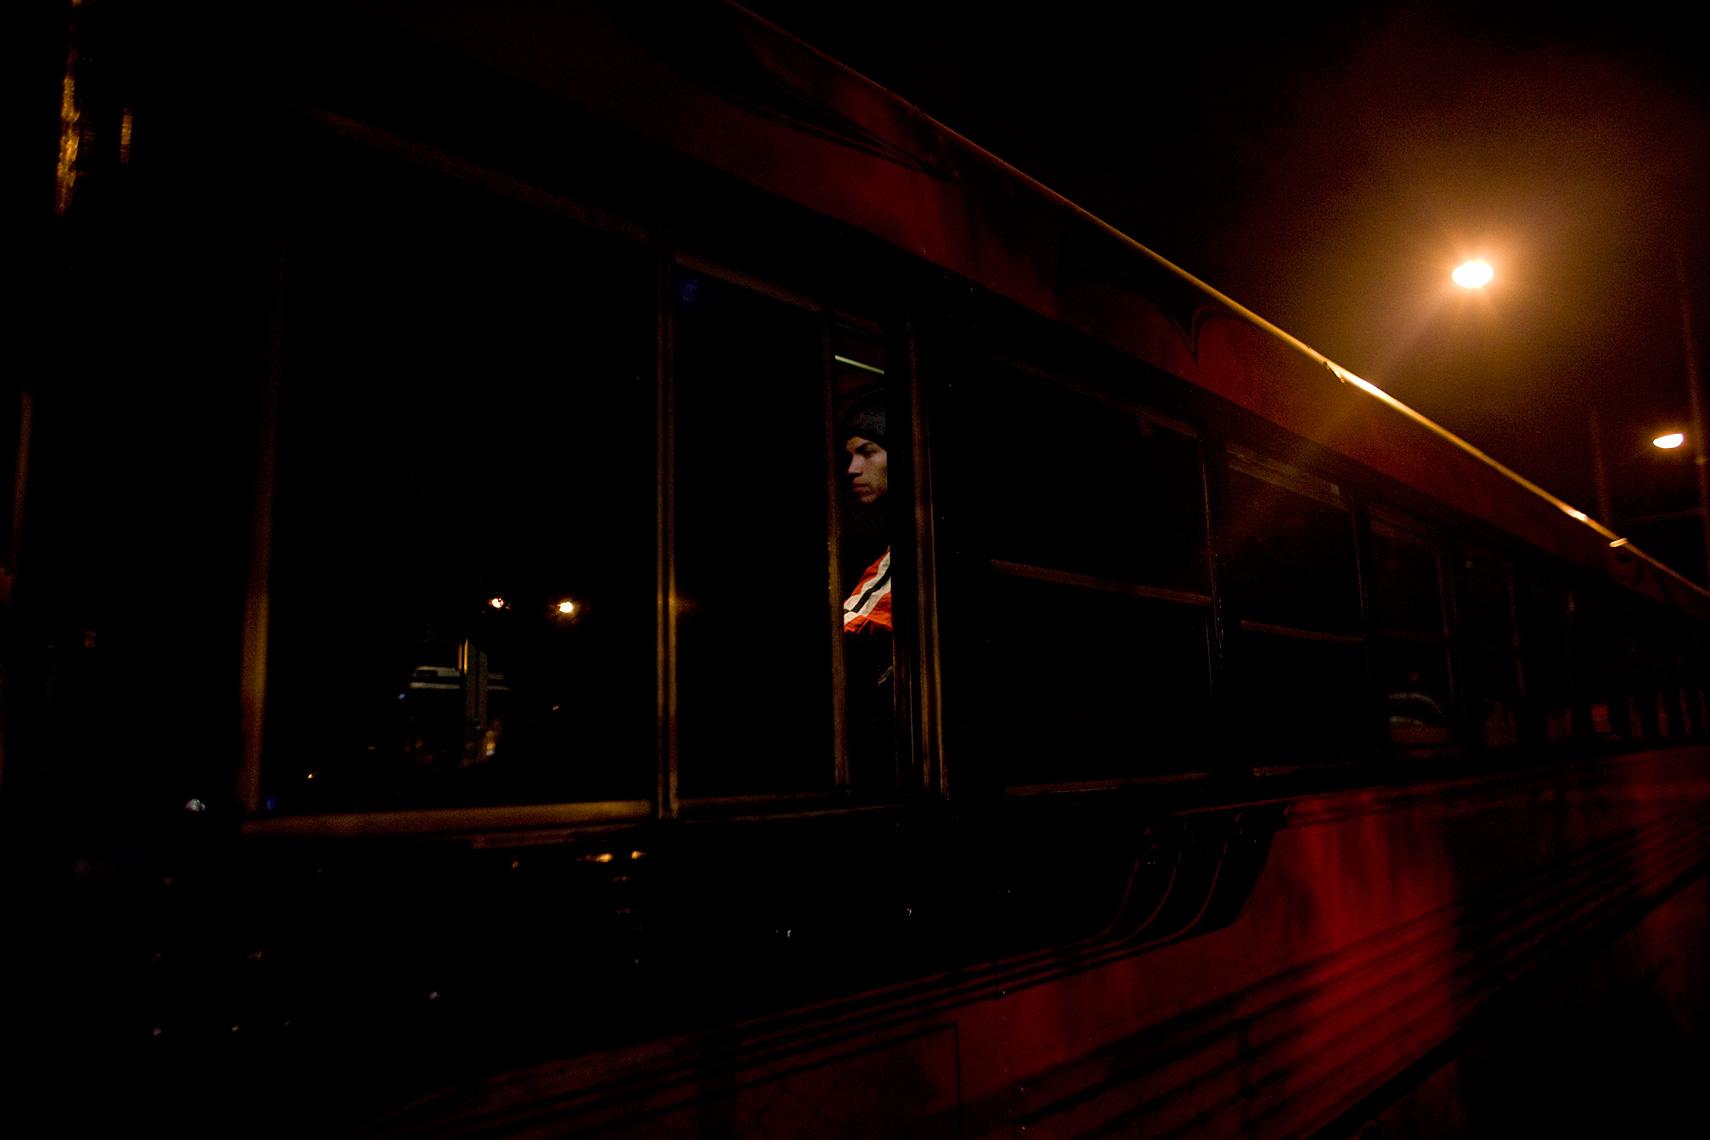 bus022.jpg